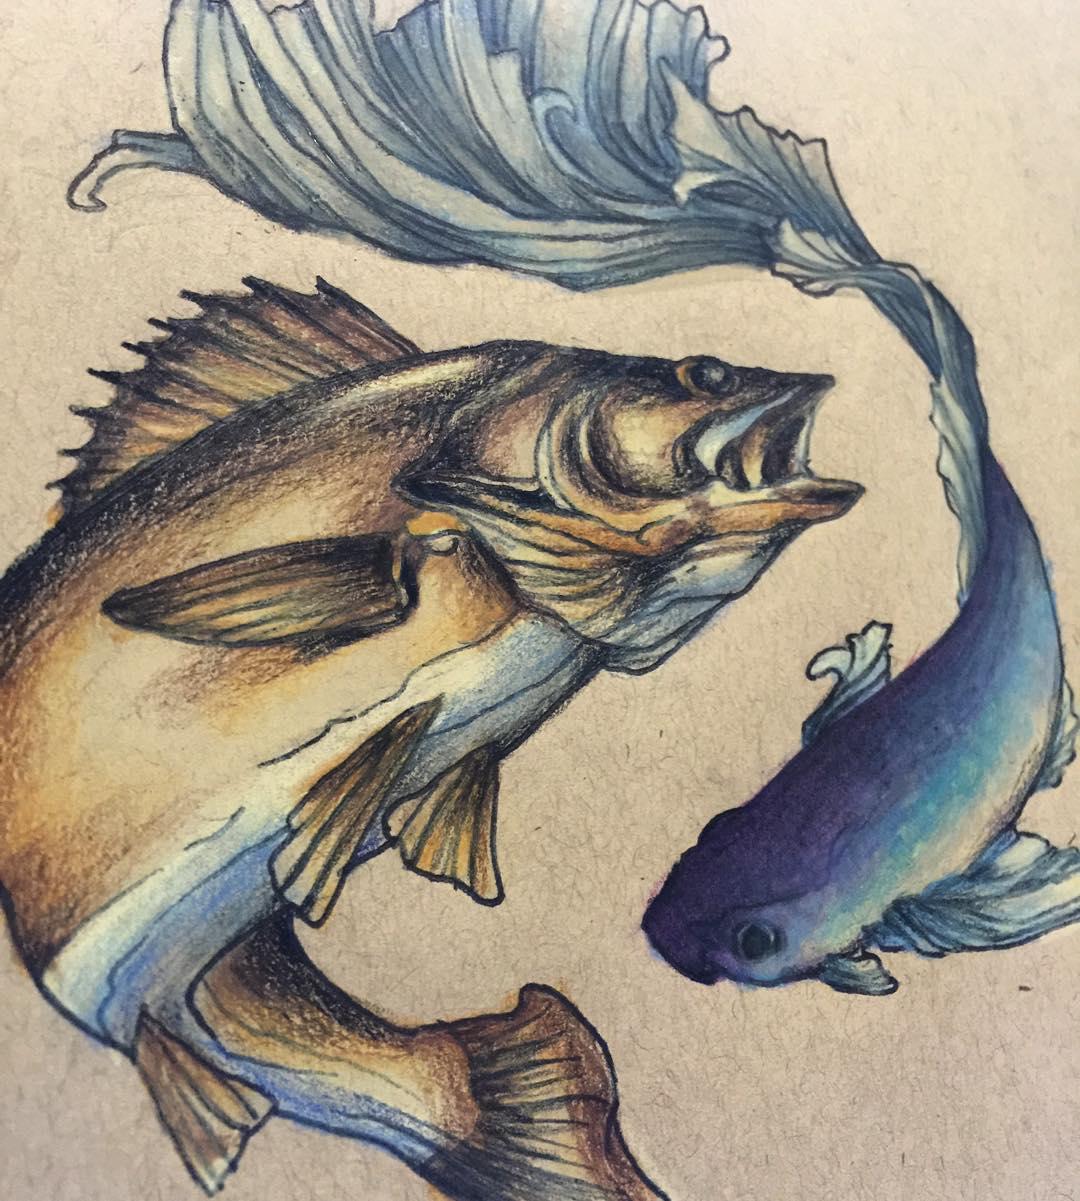 32 koi fish tattoo designs tattoo designs design trends for Koi fish pisces